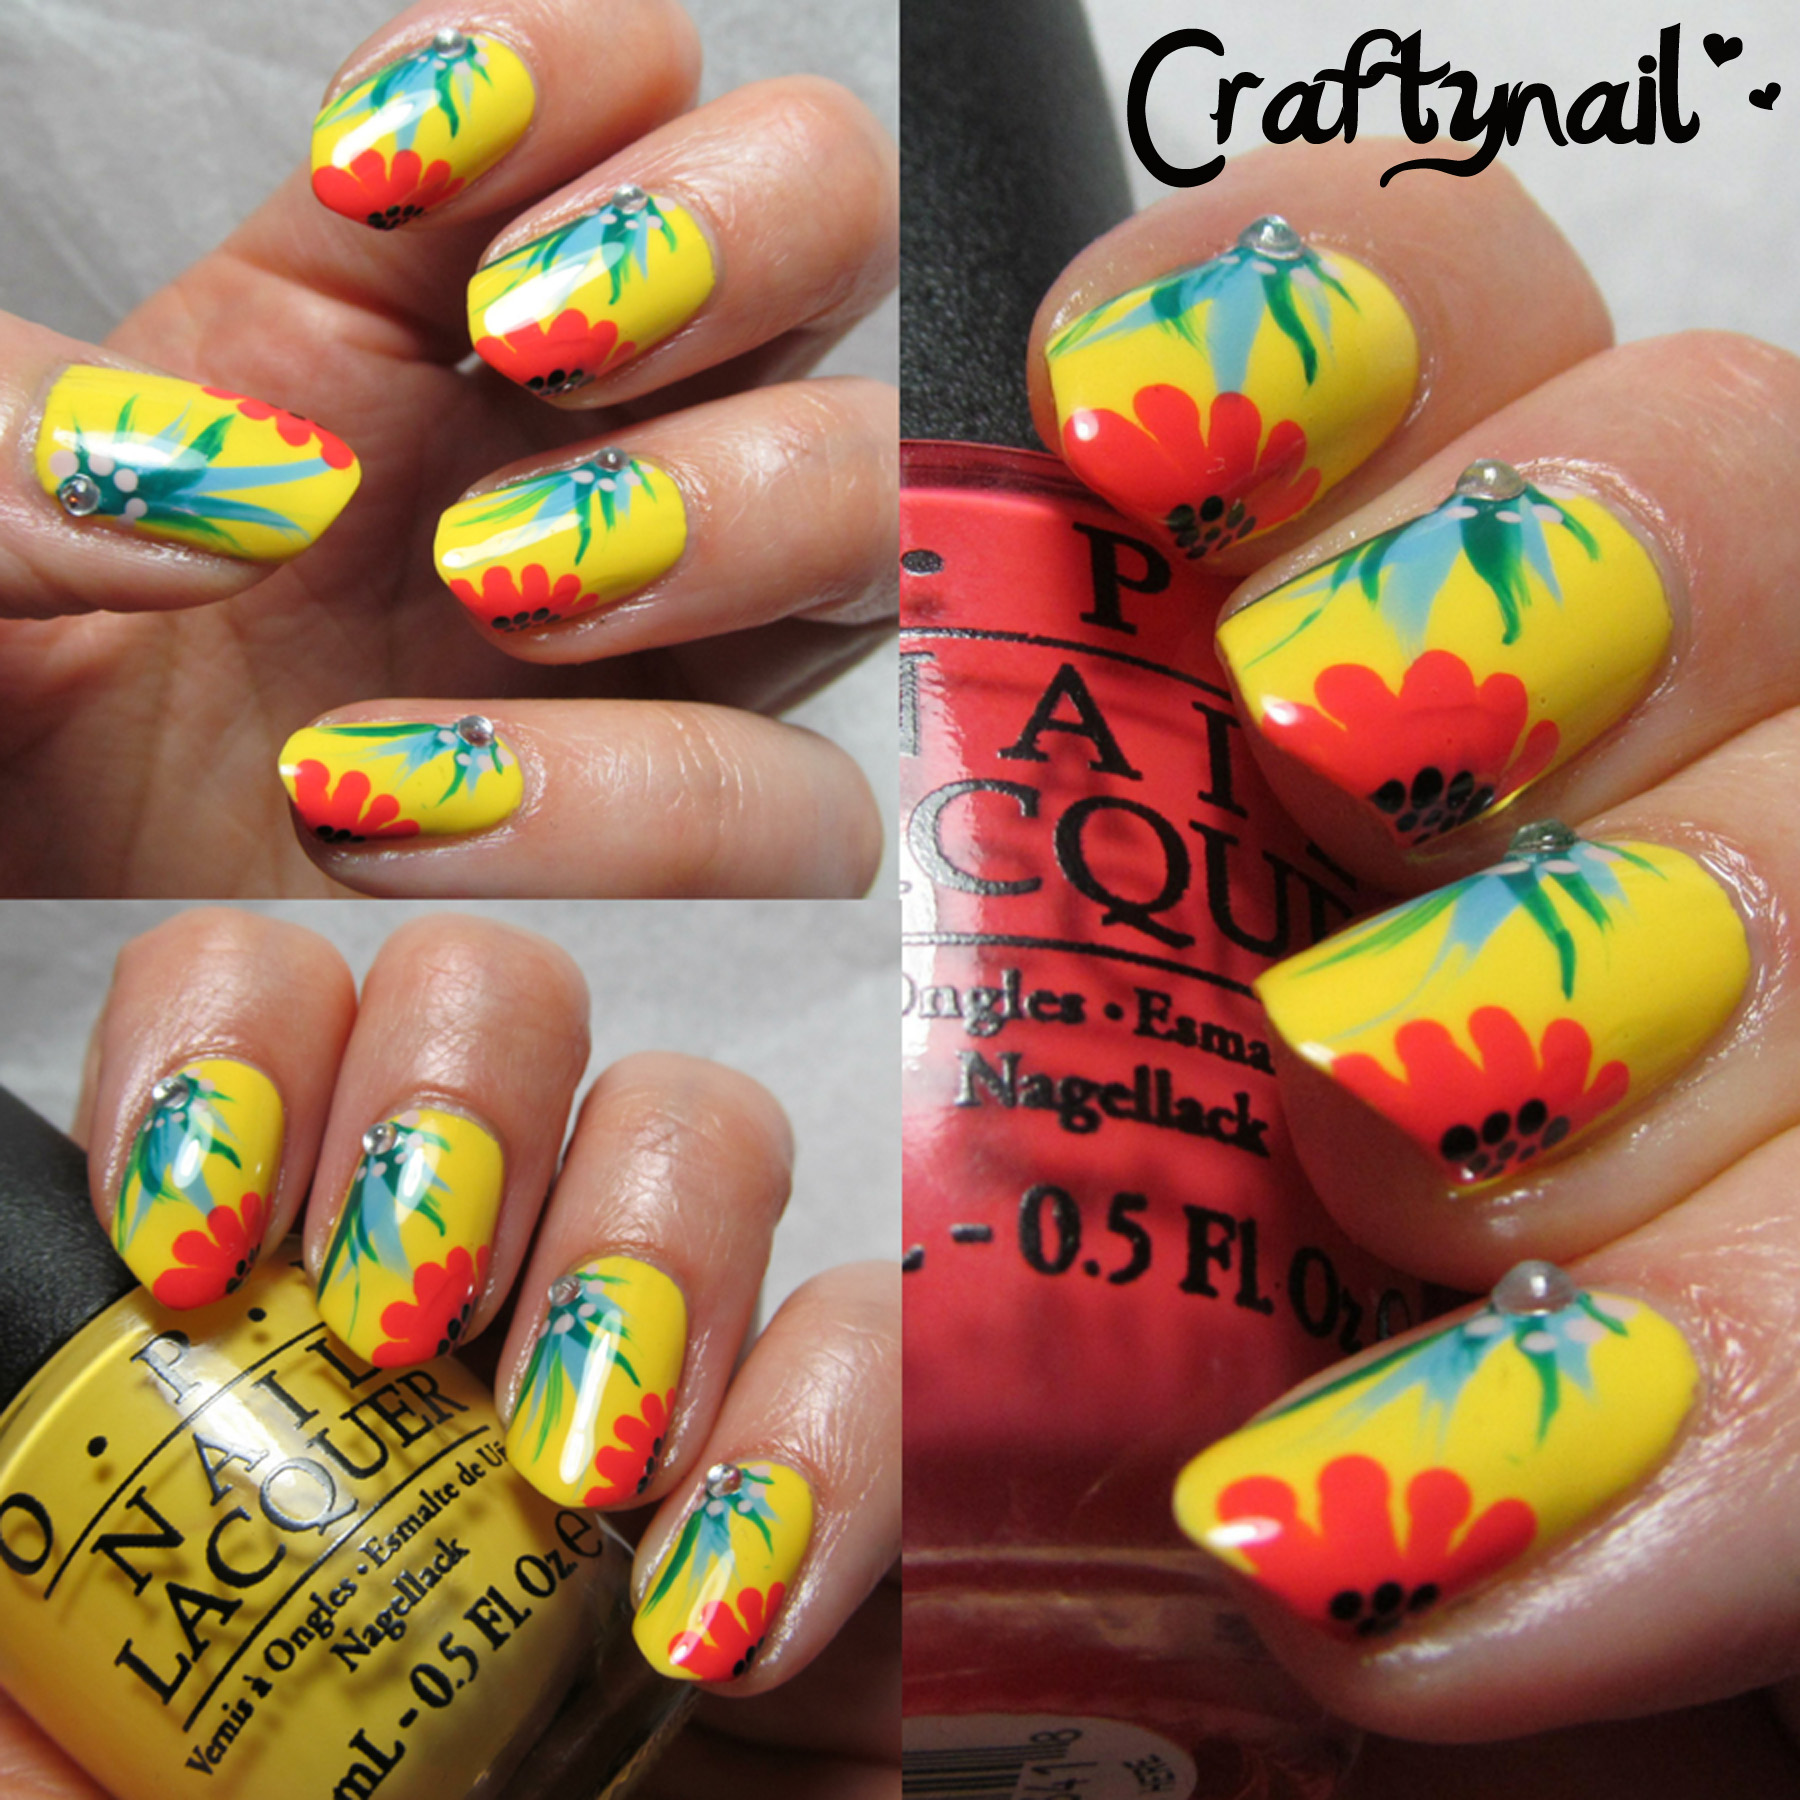 Craftynail: Nail Polish? Yes, Please